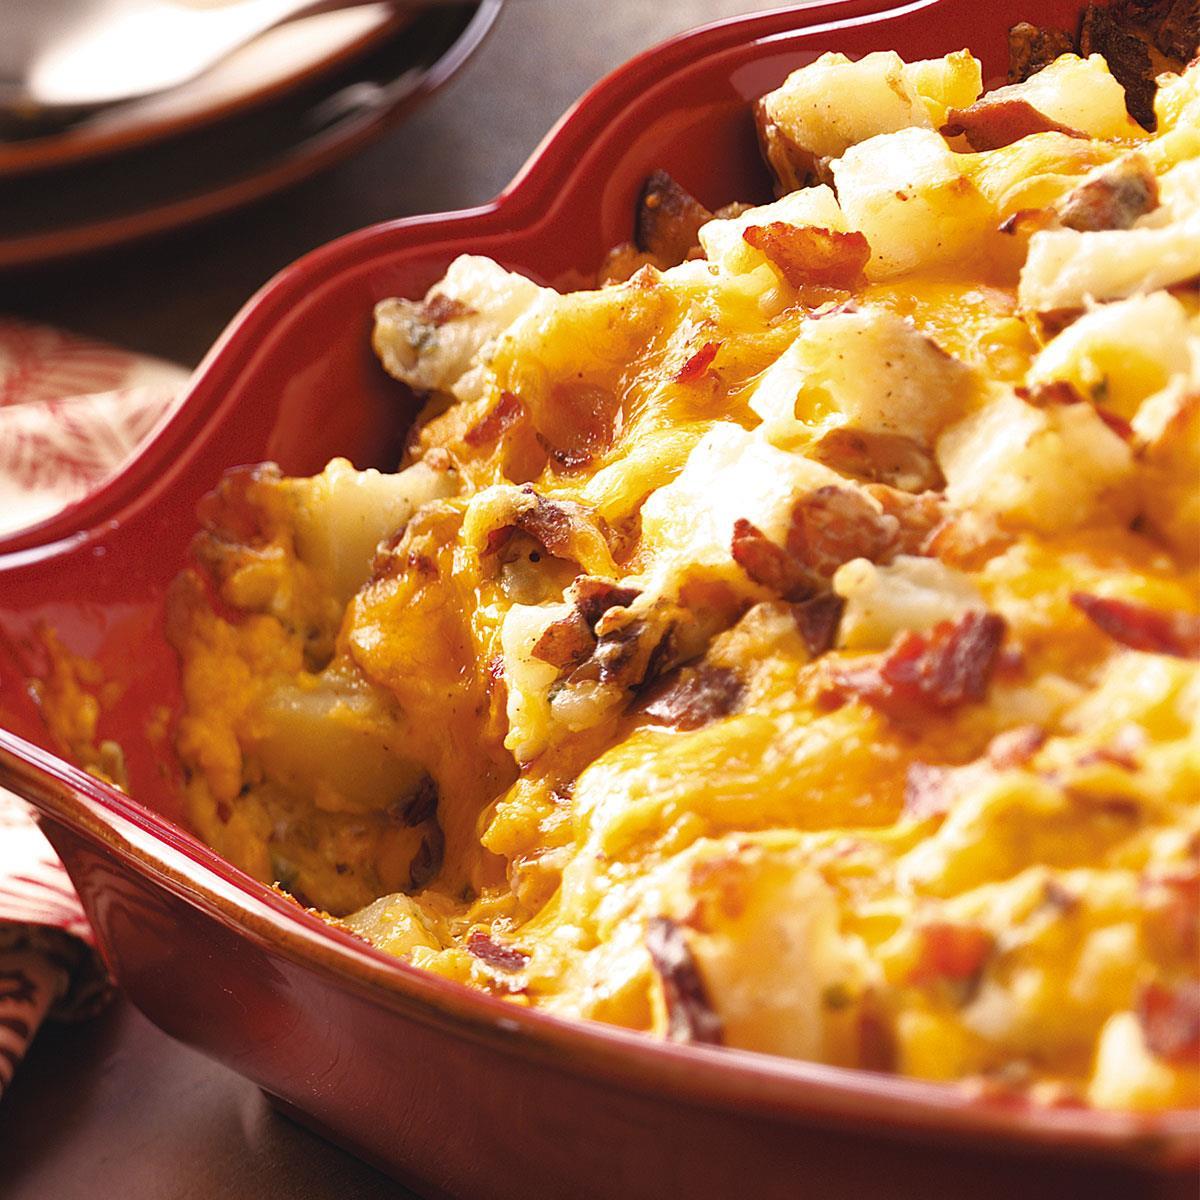 Baked Potato Casserole Recipe How To Make It Taste Of Home